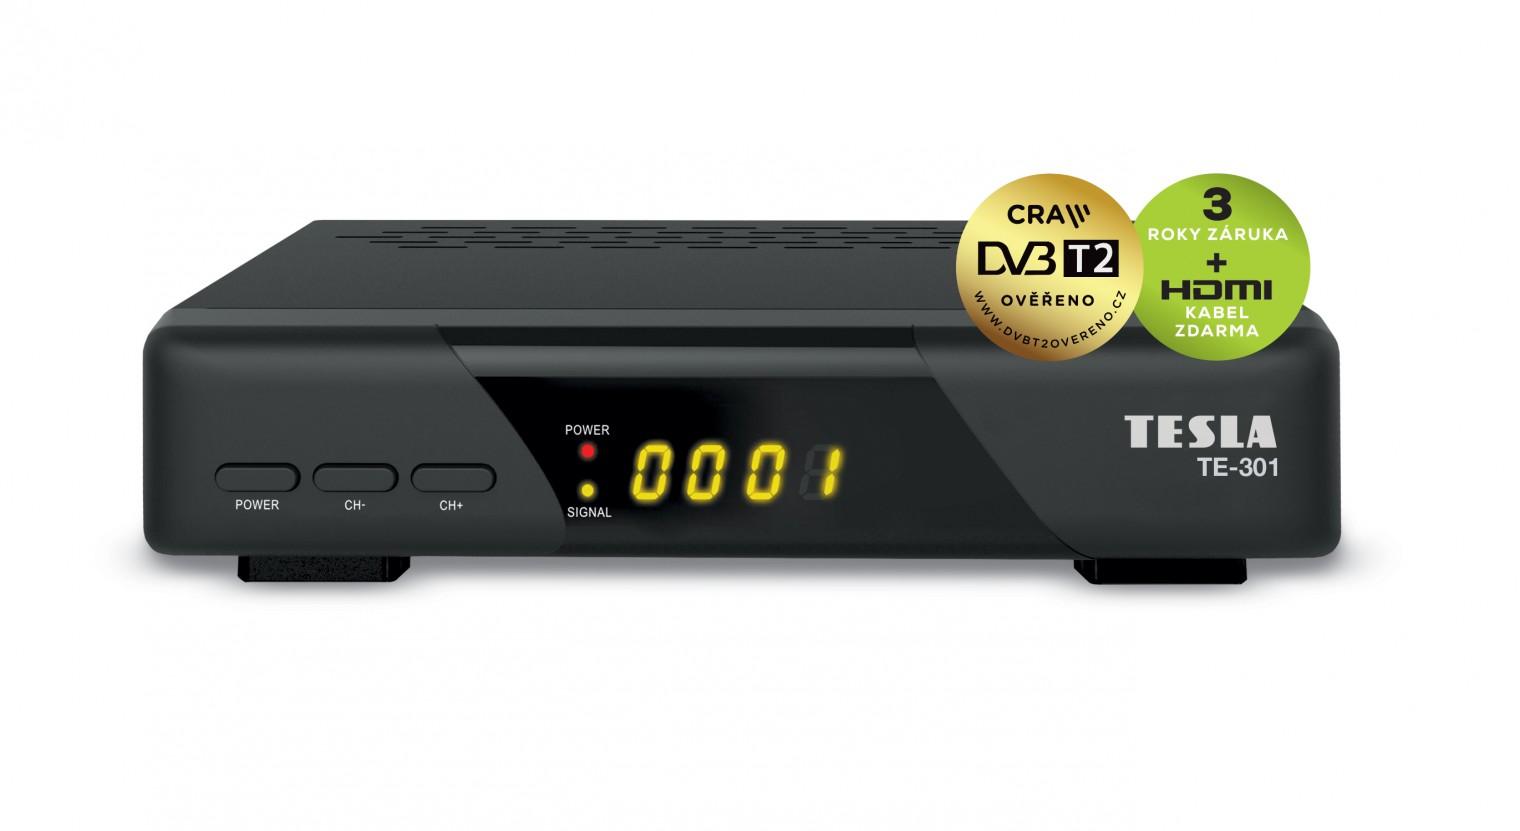 Set-top box TESLA TE-301 DVB-T2 prijímač H.265 (HEVC)